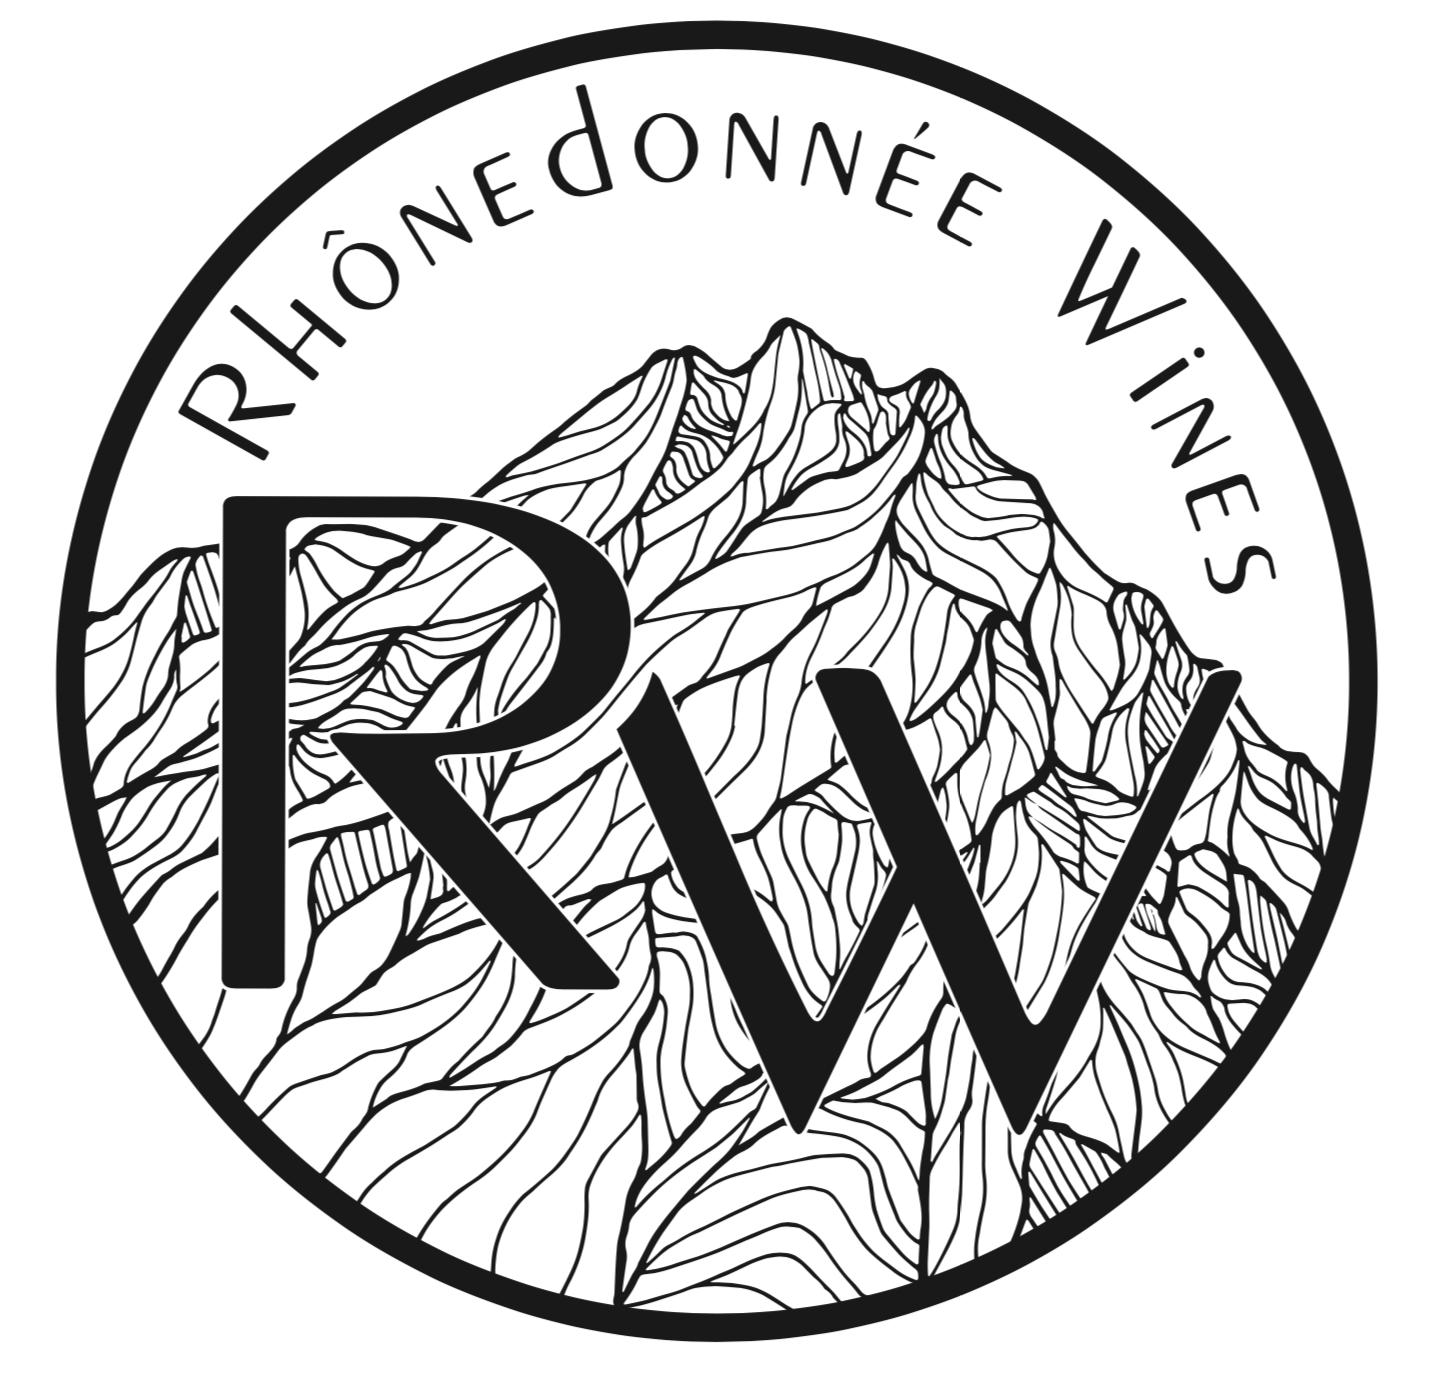 Rhônedonnée Wines